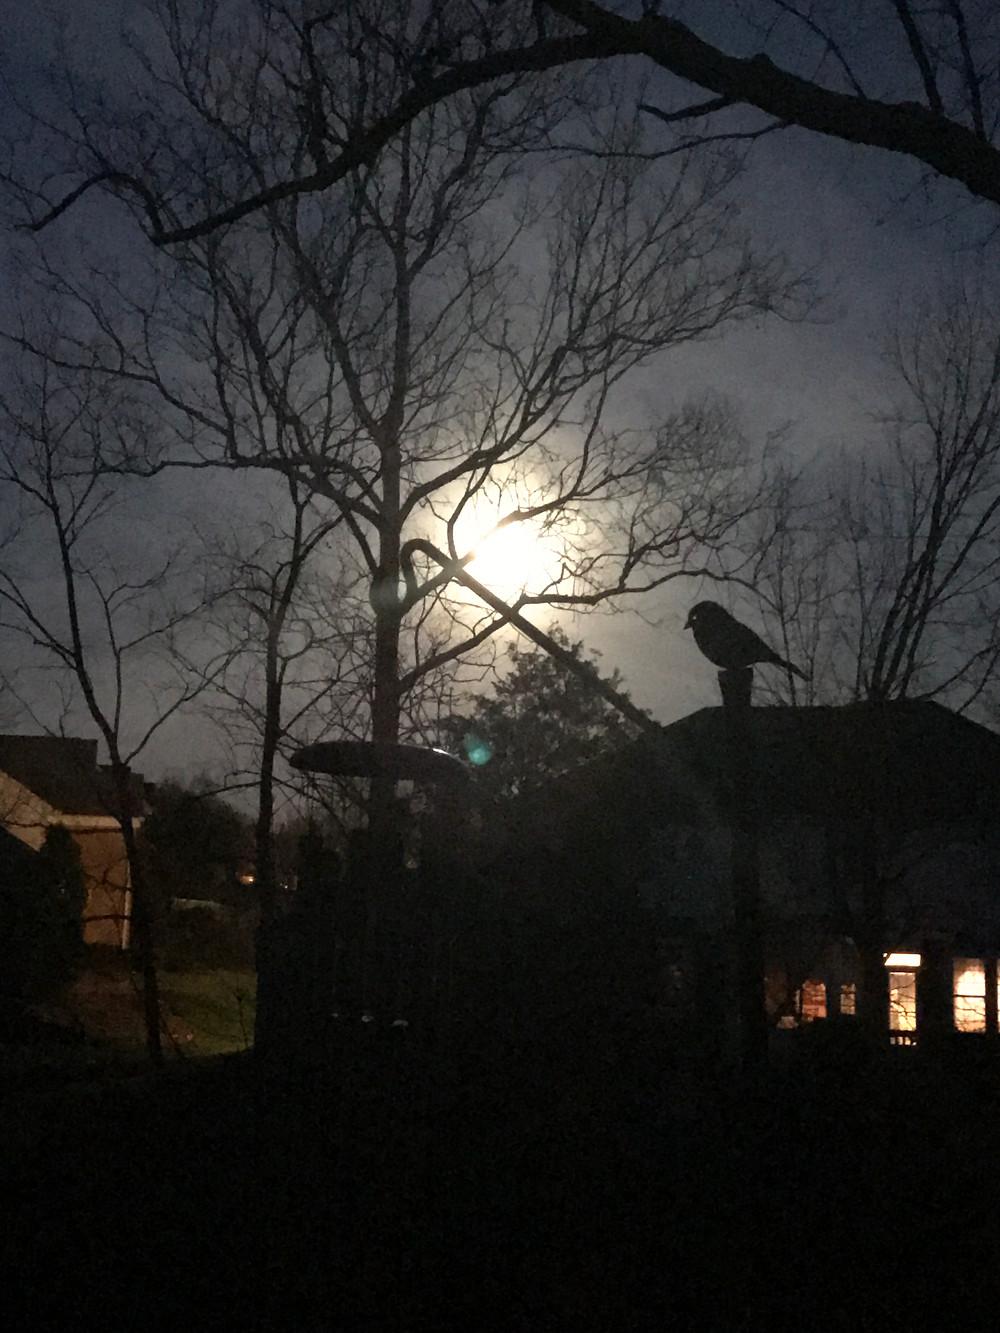 the moon in my backyard